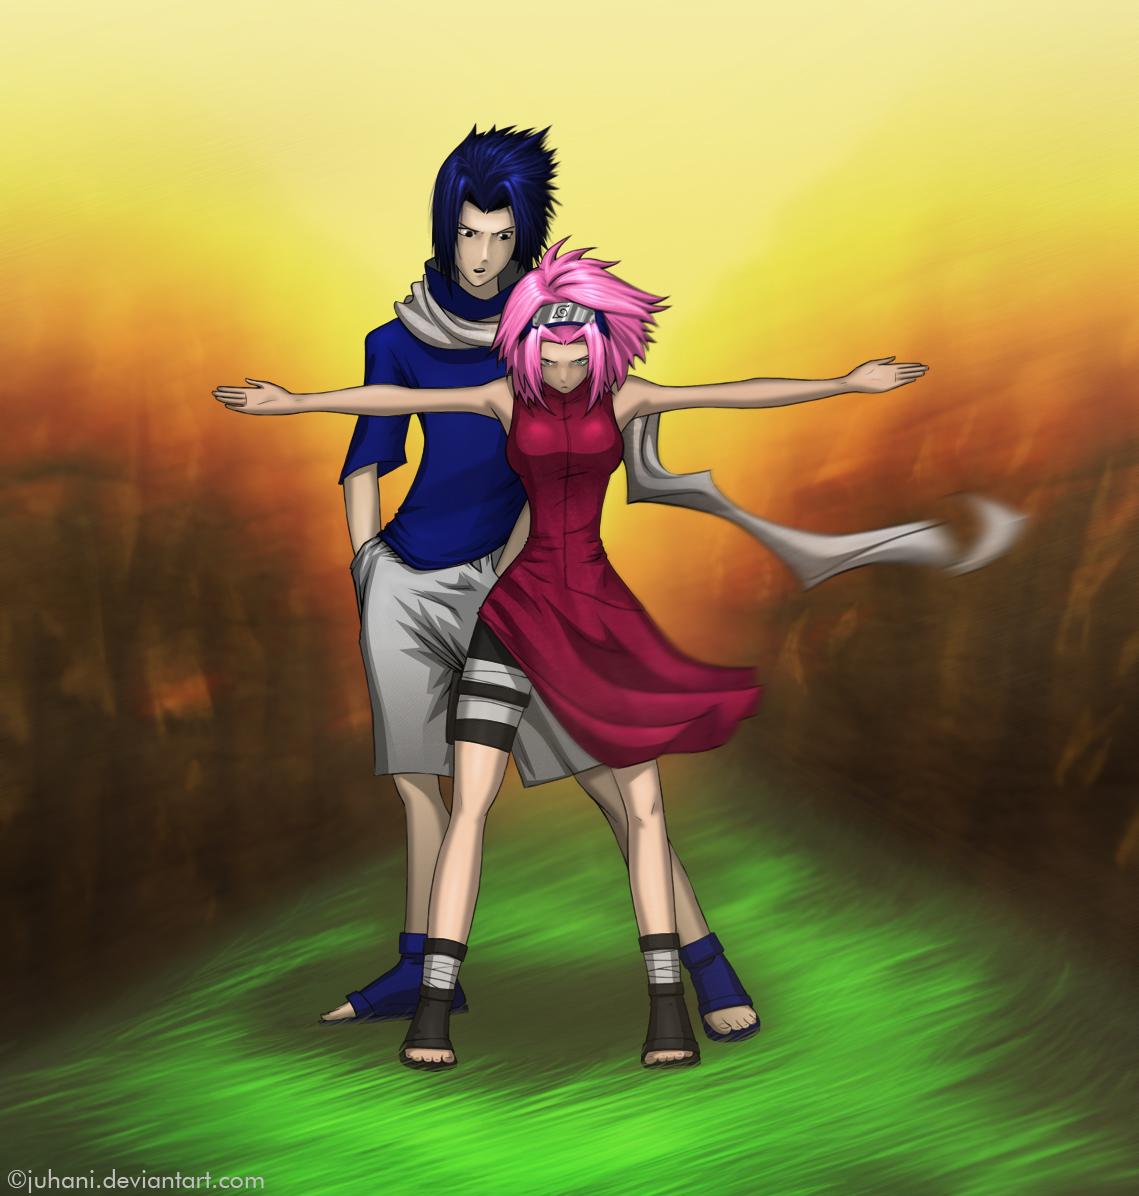 sasuke protects sakura wallpaper - photo #2